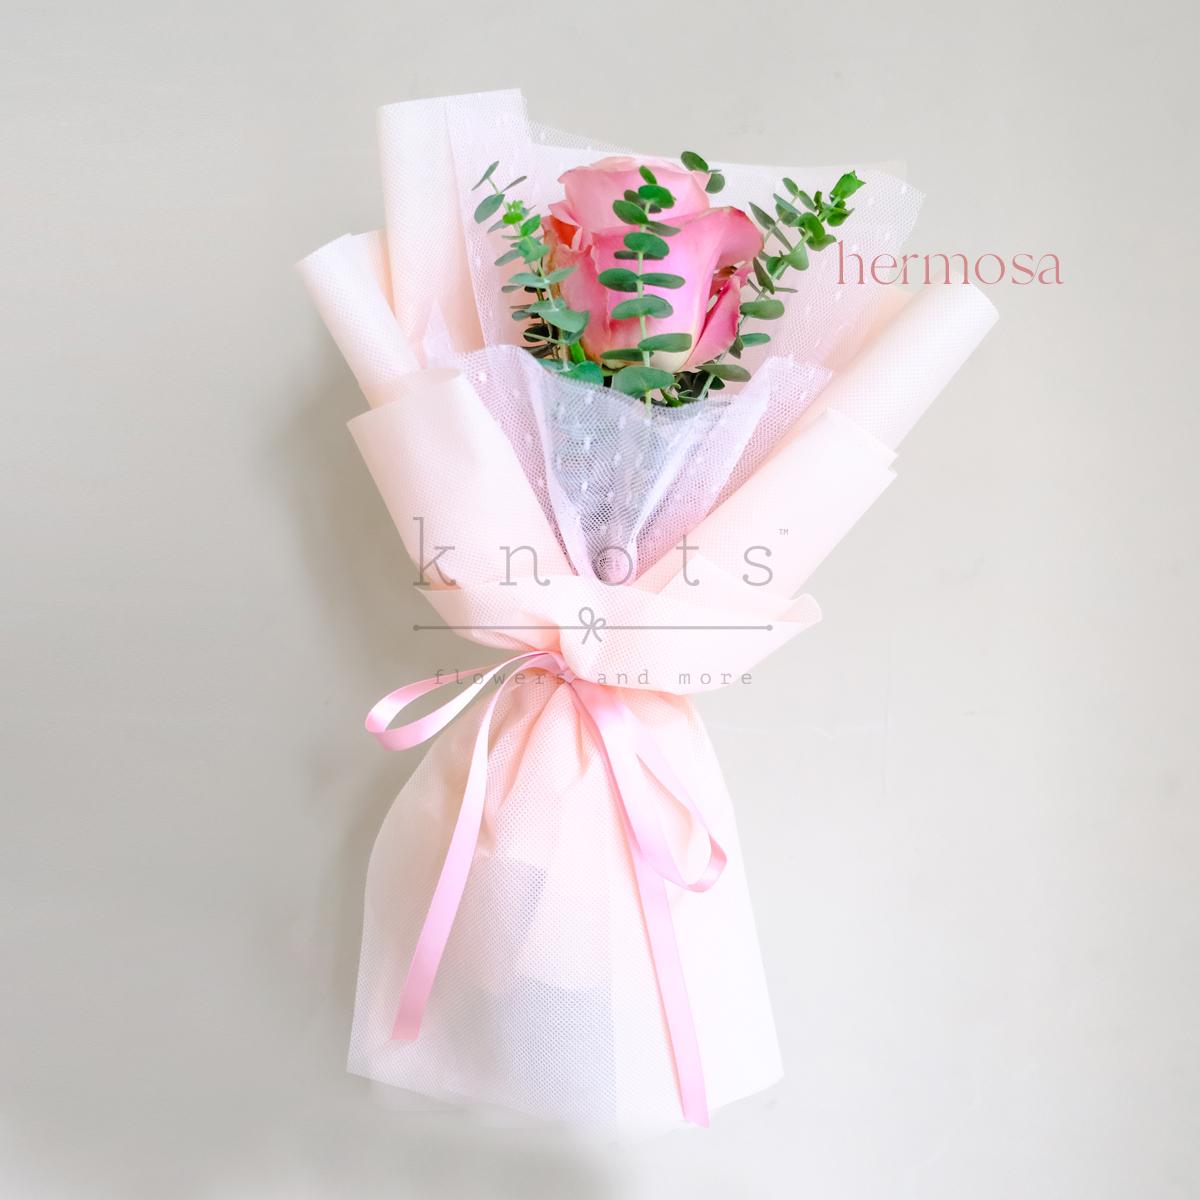 Hermosa Rose Bouquet